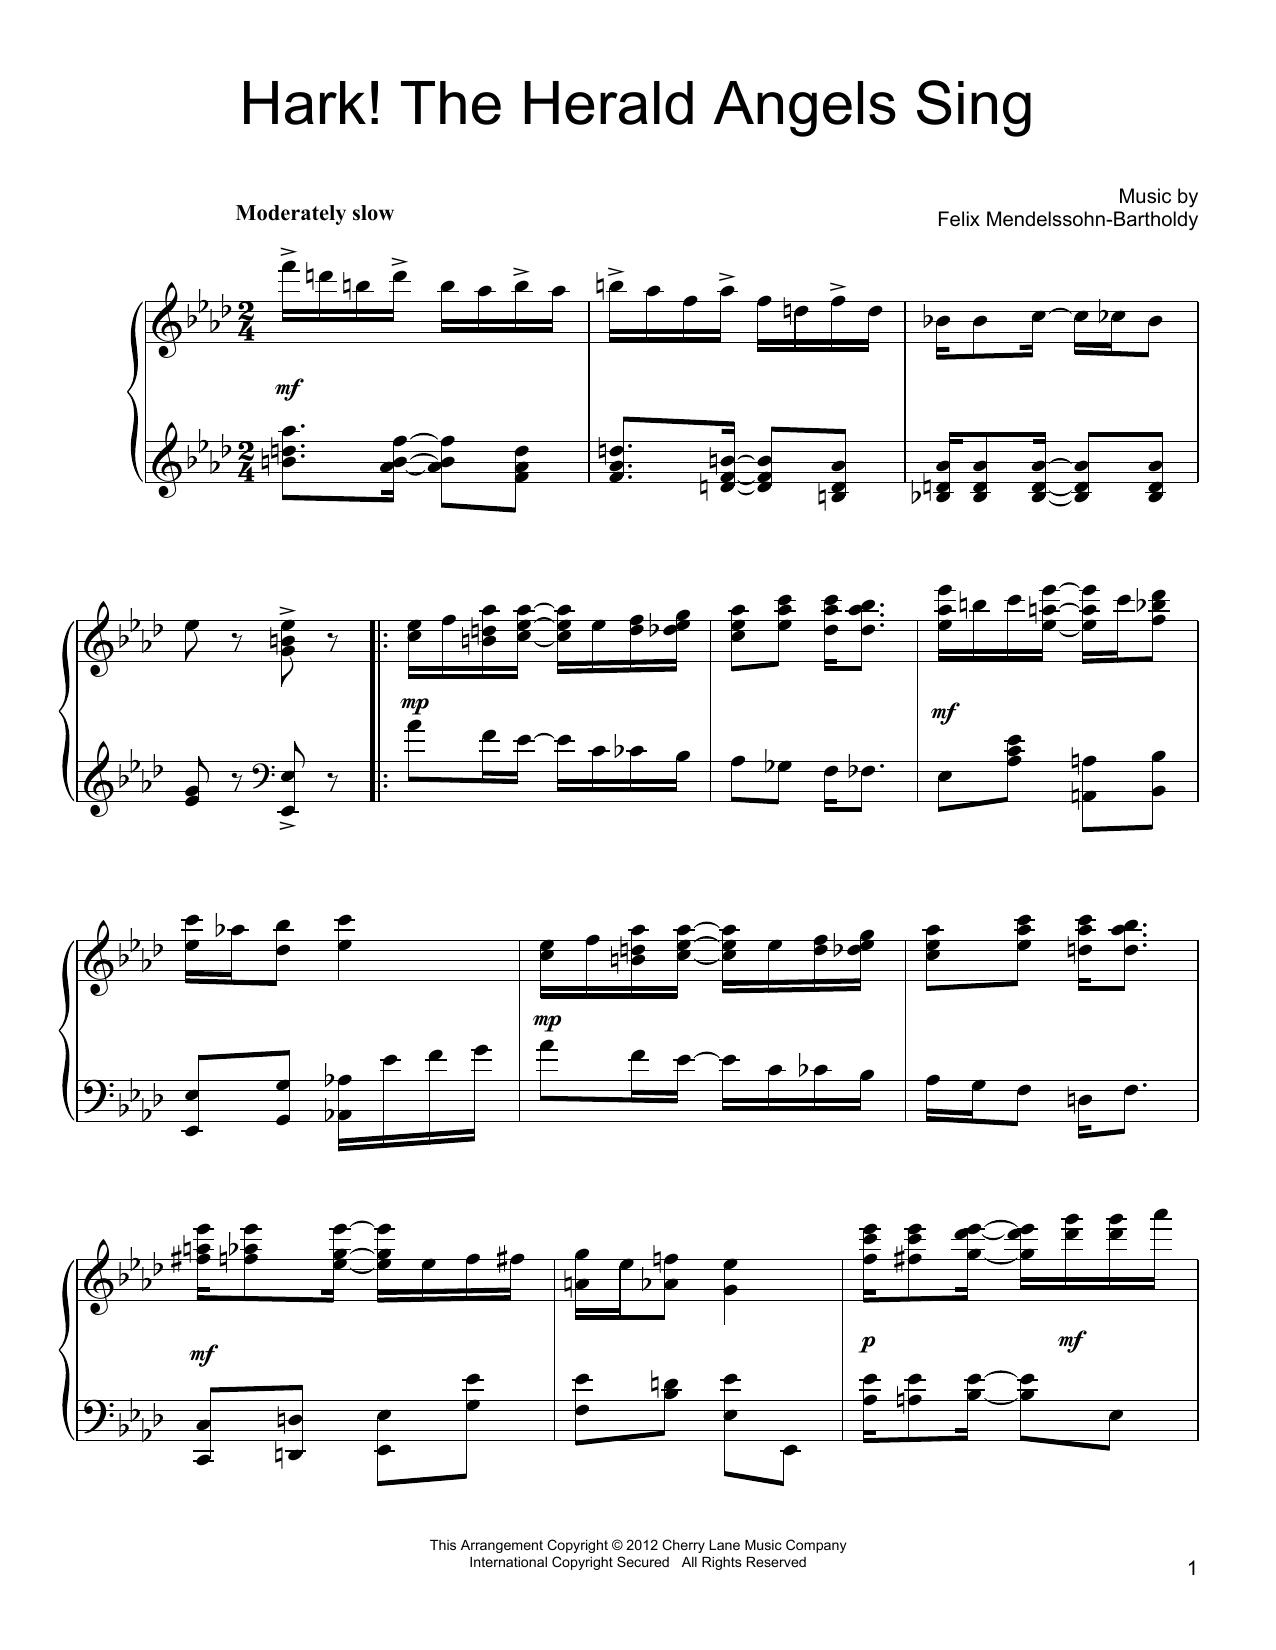 Felix Mendelssohn-Bartholdy Hark! The Herald Angels Sing [Ragtime version] sheet music notes and chords. Download Printable PDF.